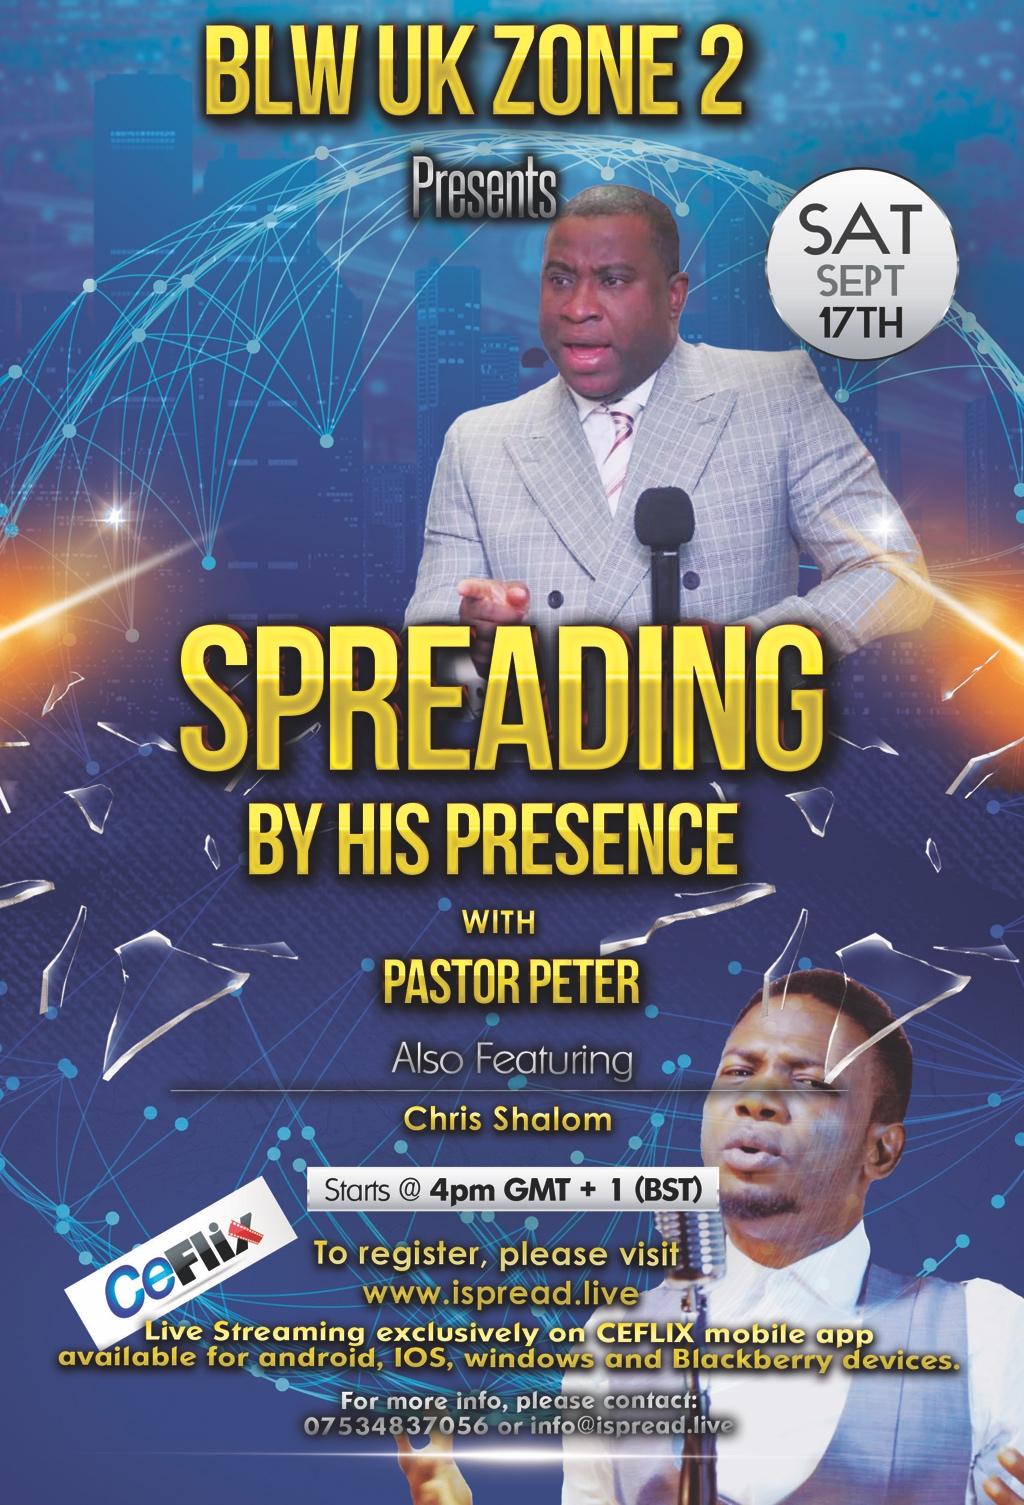 #spreadingbyhispresence #ispread